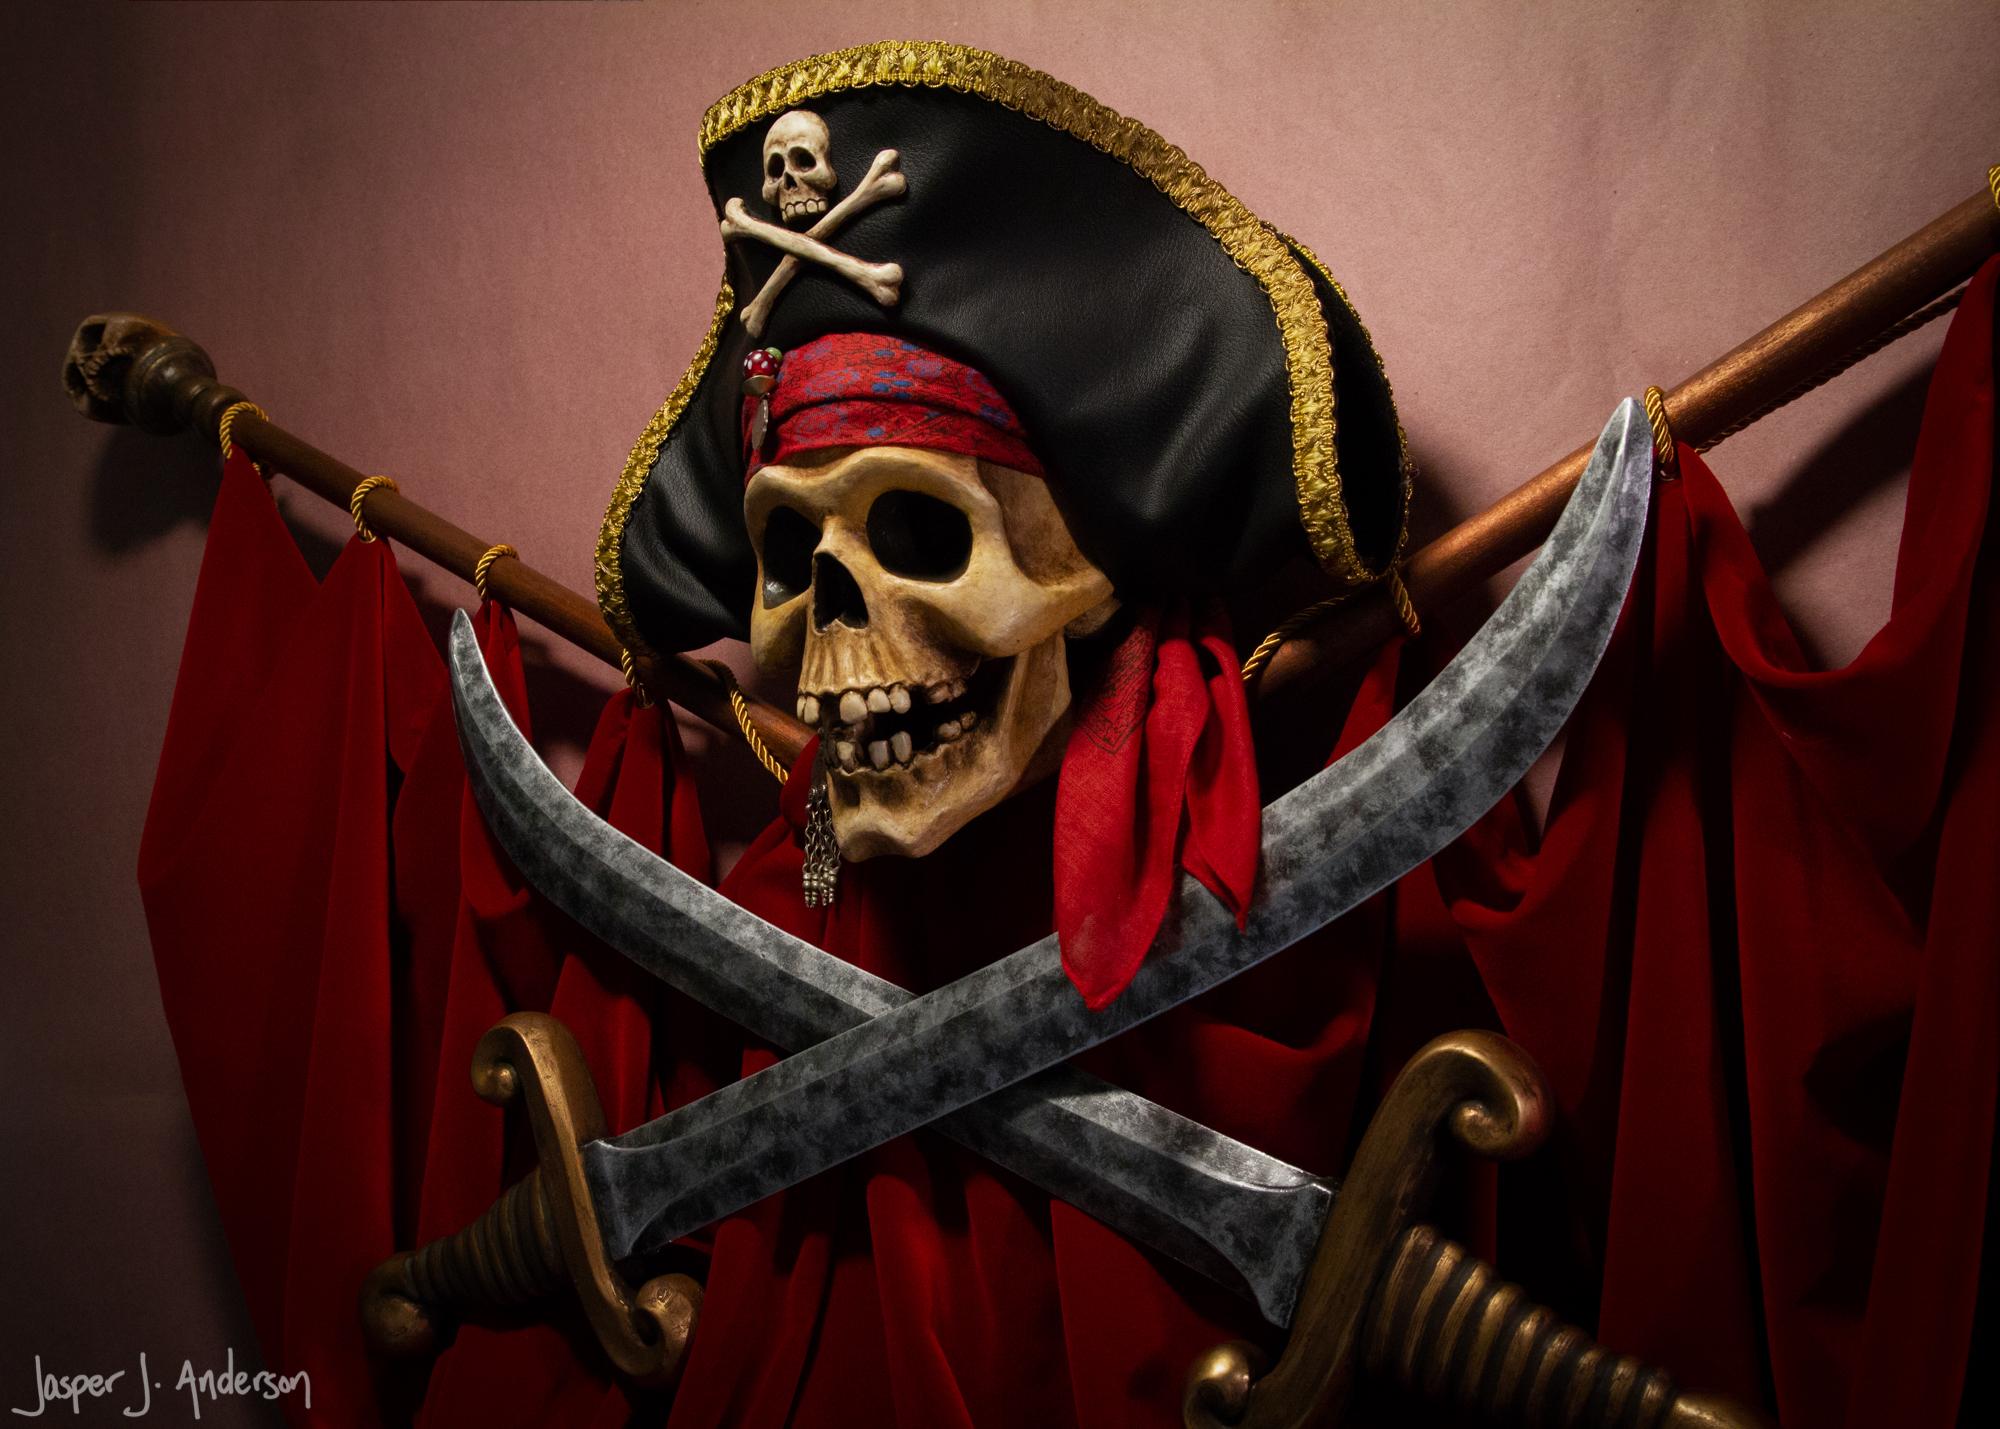 Modern Talking Pirate Skull-0062-Edit-2.jpg